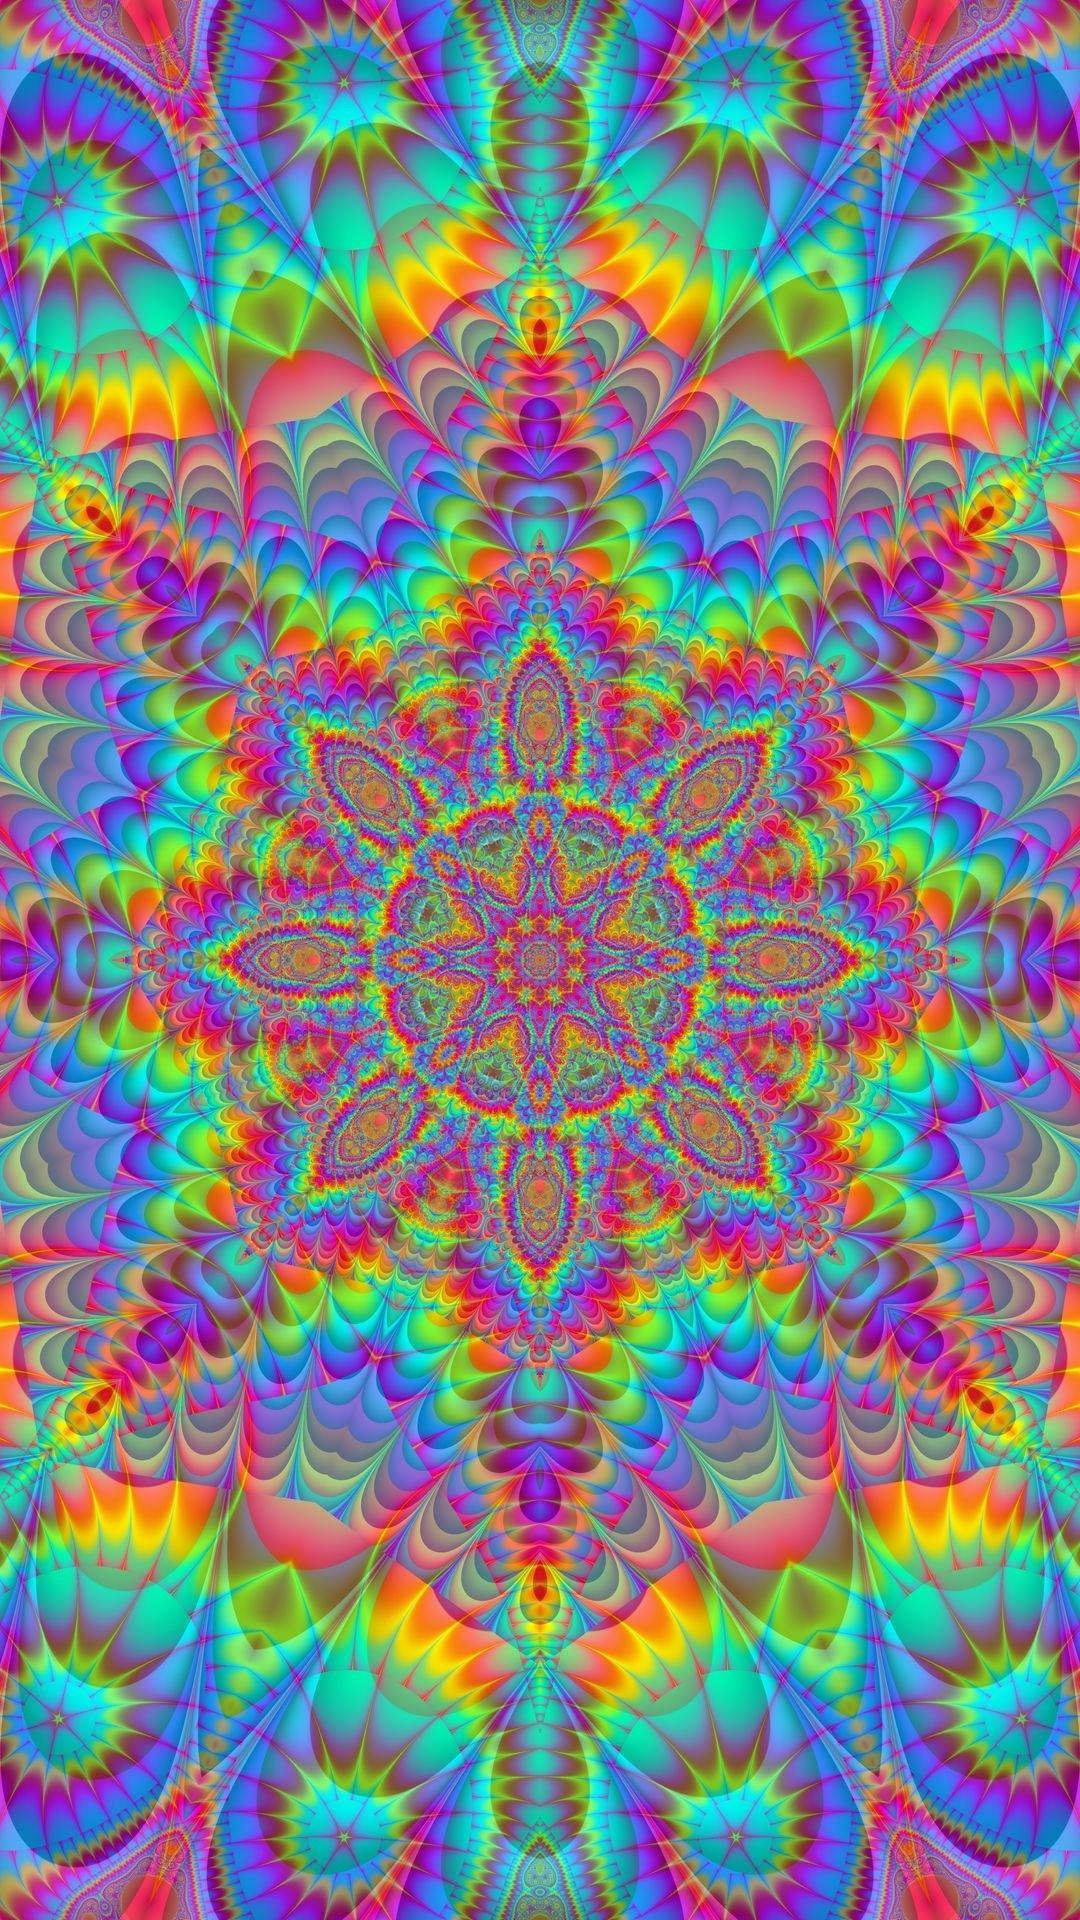 Colorful phone wallpaper hd